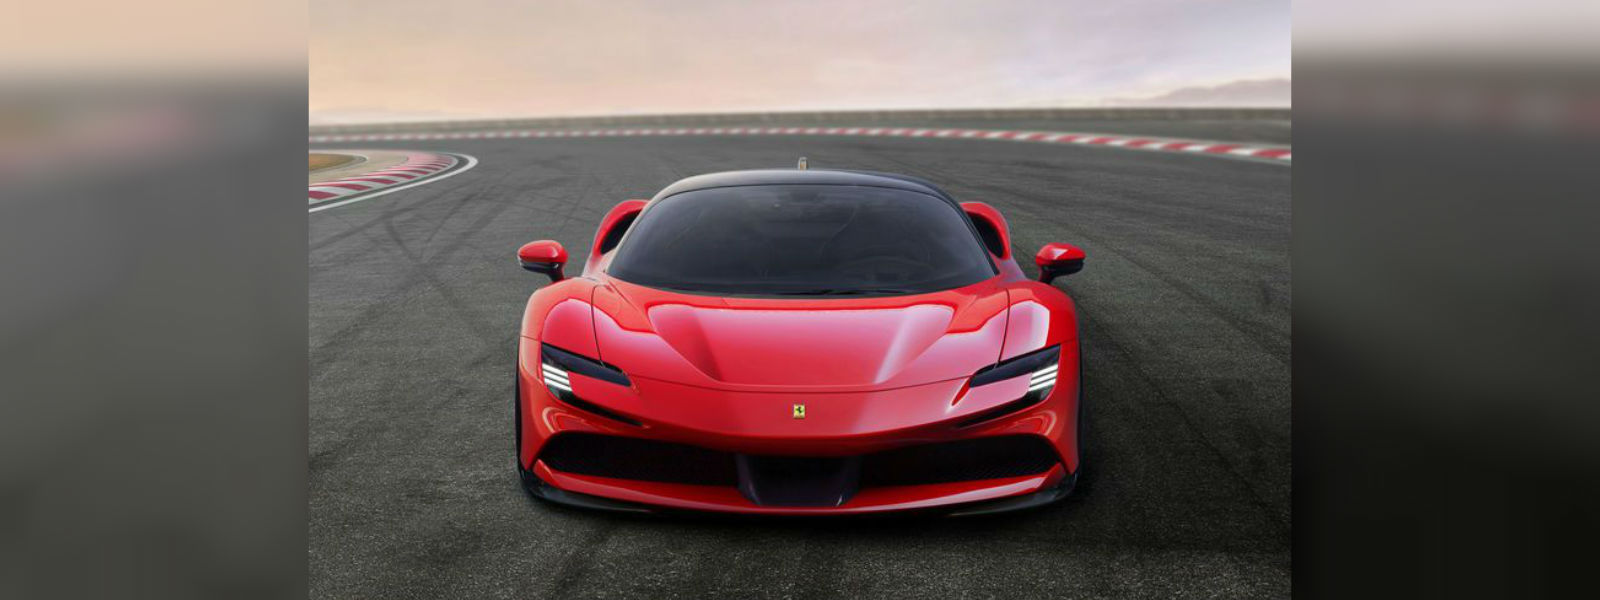 Ferrari accelerates move into hybrid cars